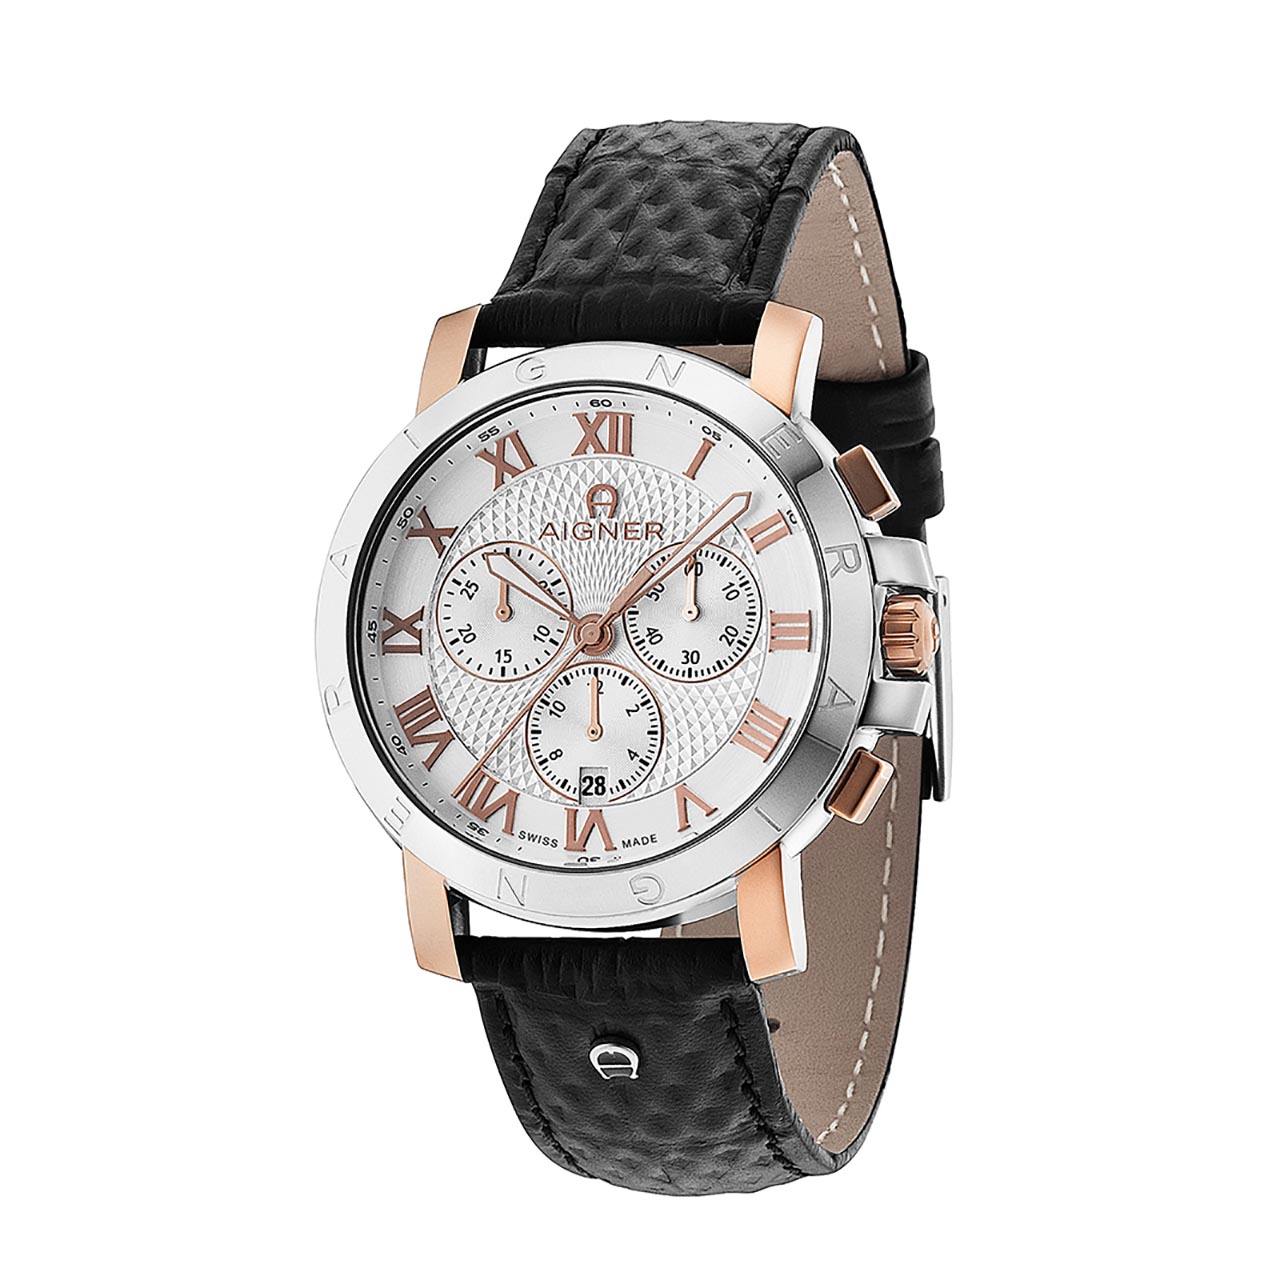 ساعت مچی عقربه ای مردانه اگنر مدل A09504 47